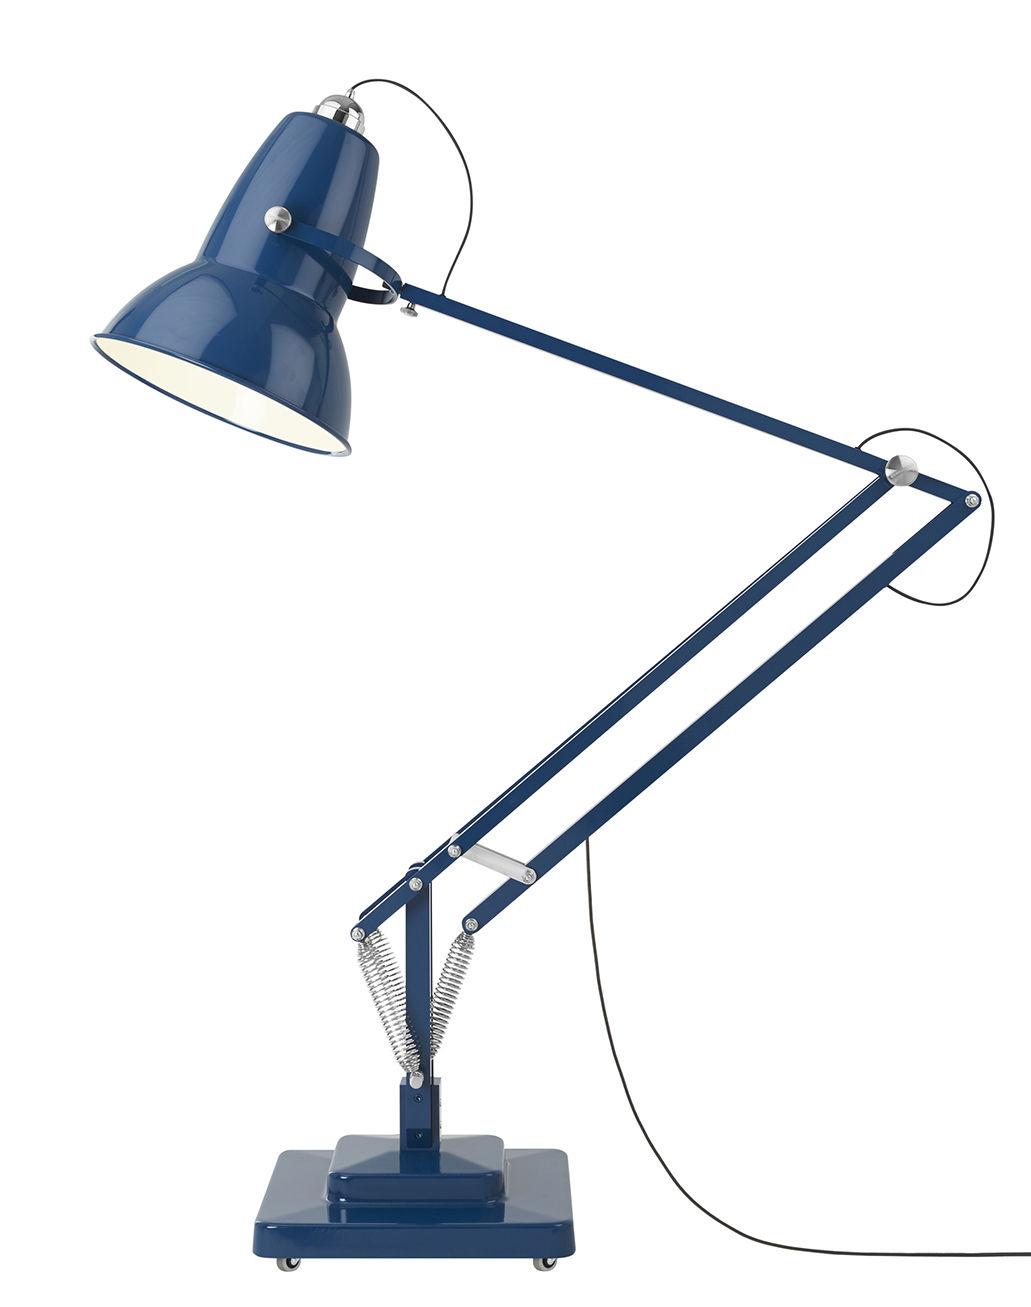 Luminaire - Lampadaires - Lampadaire Original 1227 Giant Outdoor / H 270 cm - Anglepoise - Bleu Marine - Acier, Aluminium, Fonte